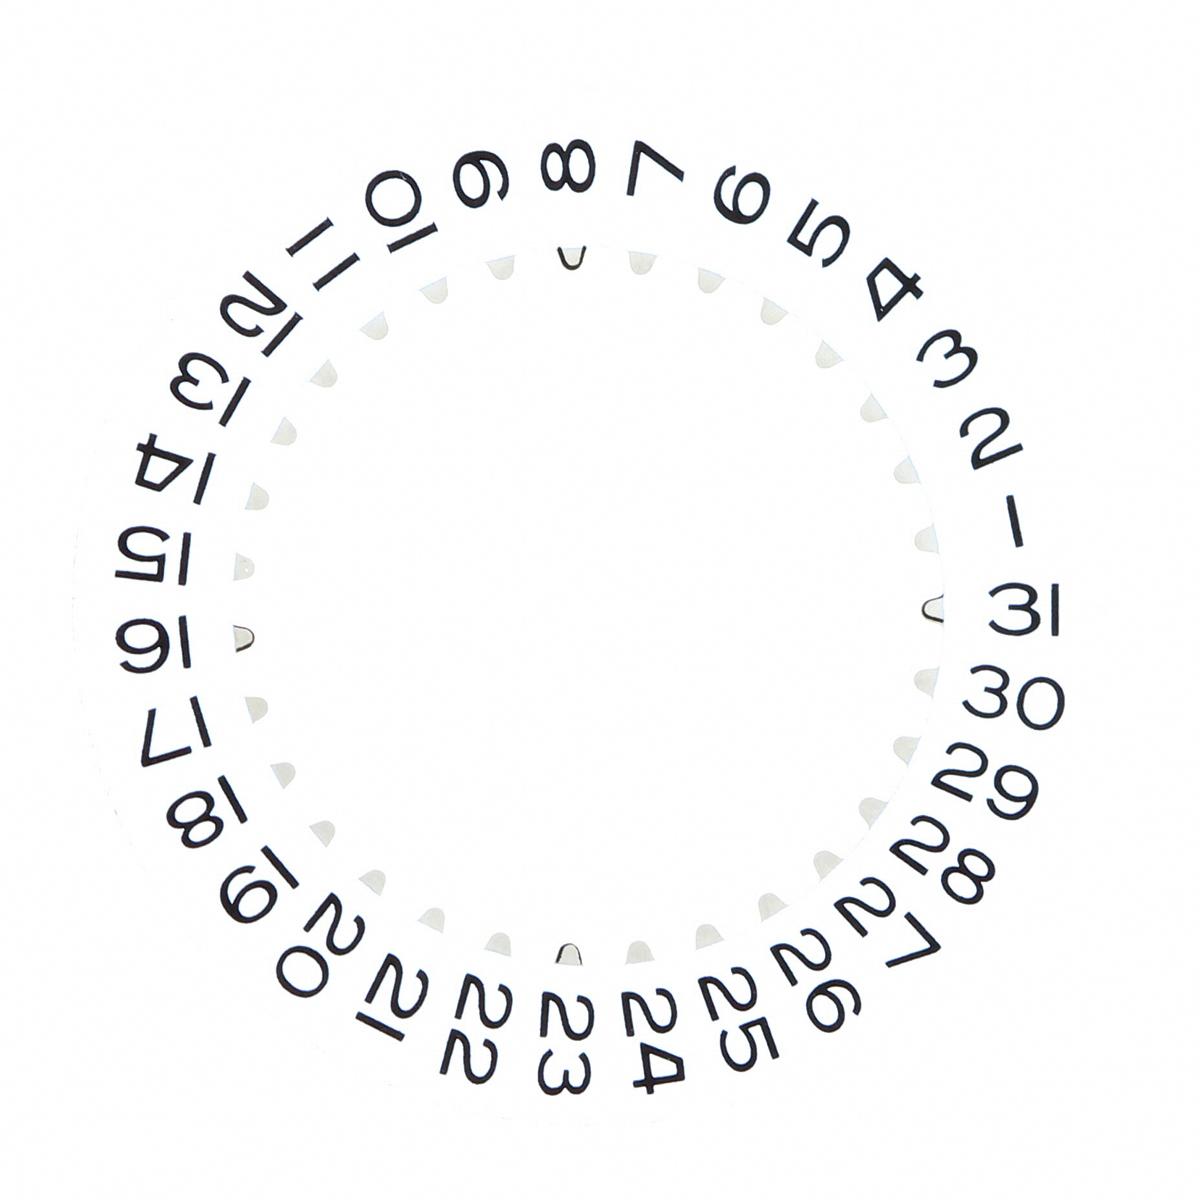 Calendar Date.Details About Calendar Date Disc For Rolex Datejust 16200 16233 116610 Movement 3135 3155 Whit